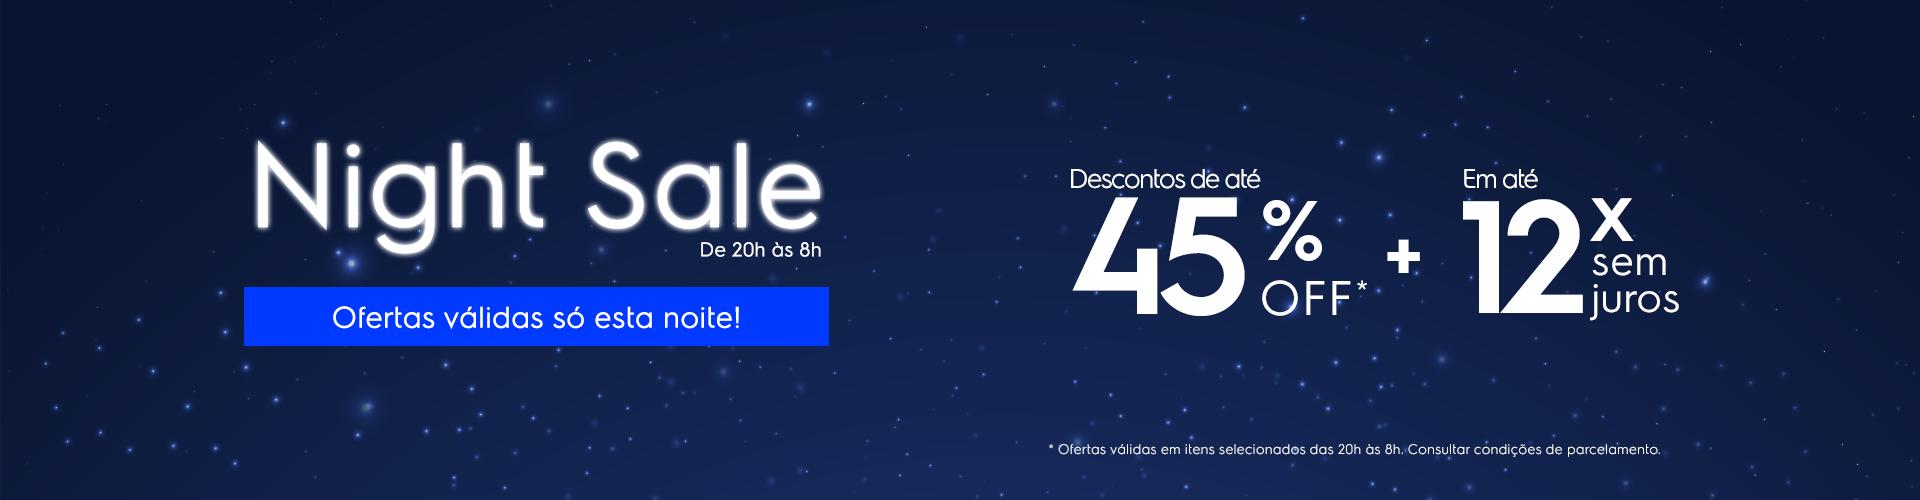 Banner Spot - Night Sale / 48 horas